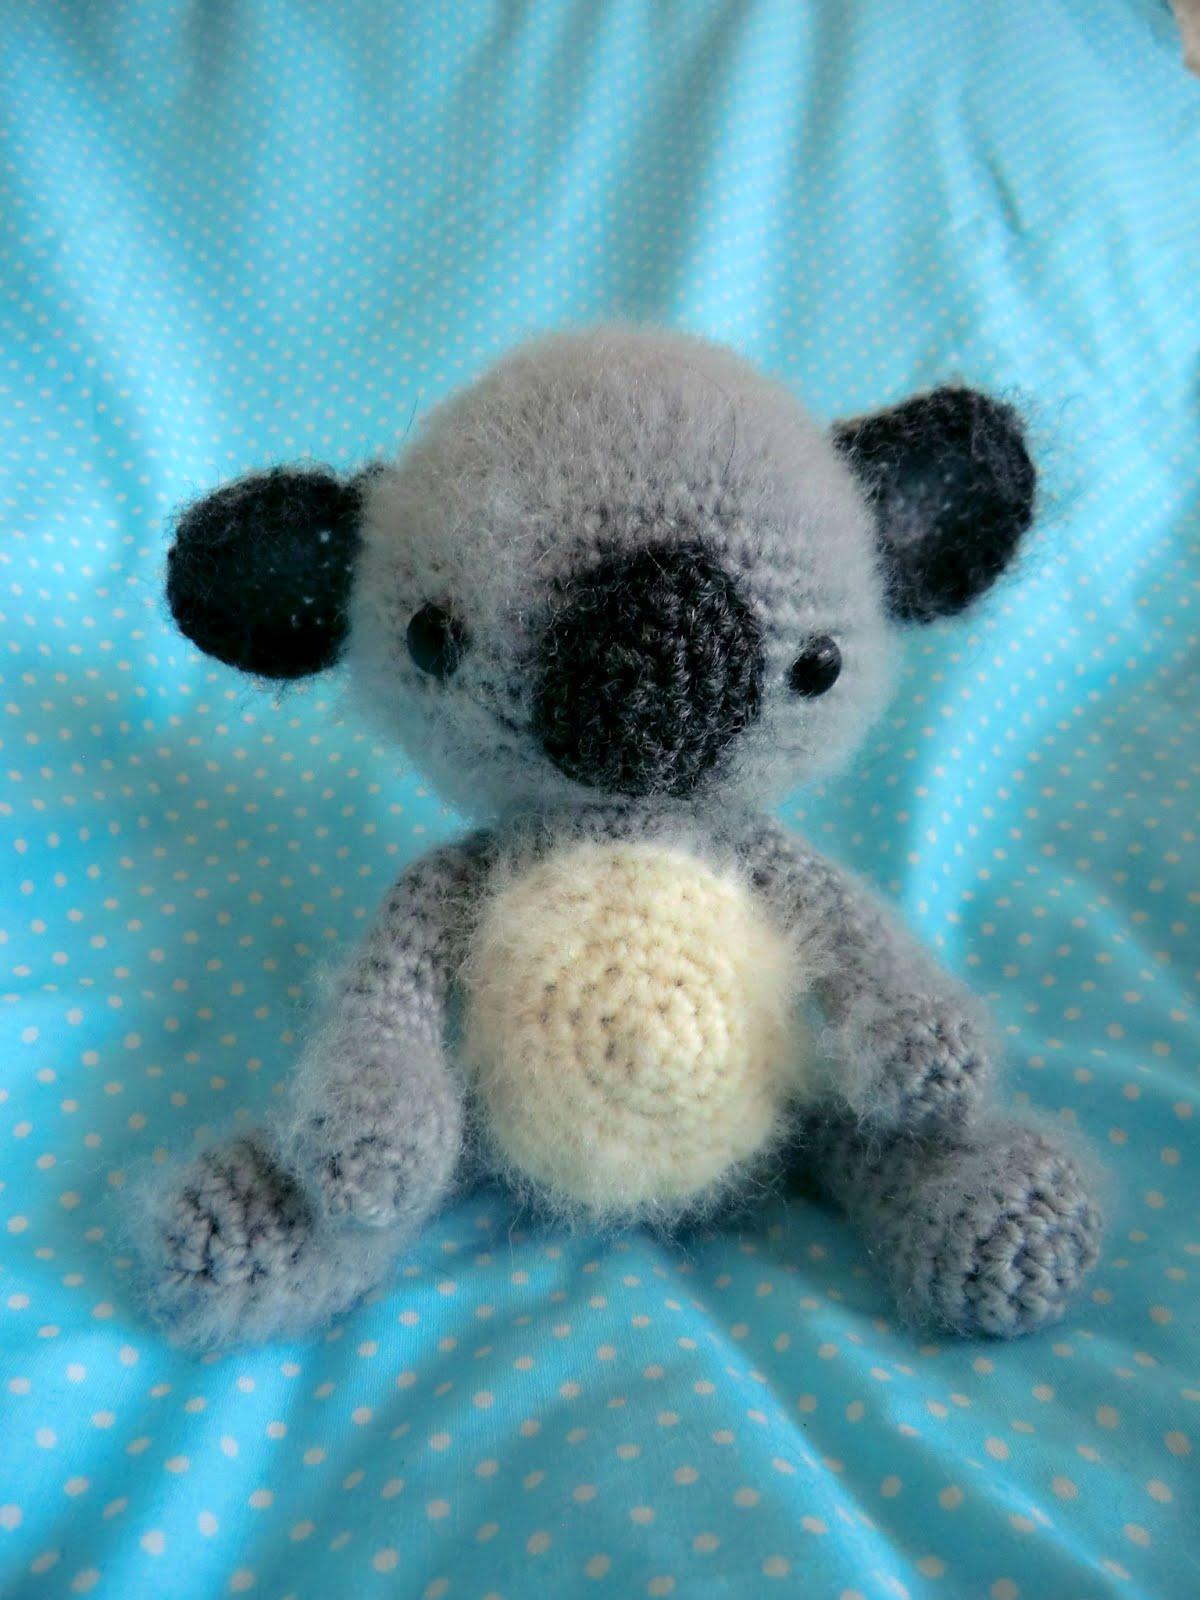 Koala Amigurumi Nose : Amigurumi Barmy: Fluffy koala